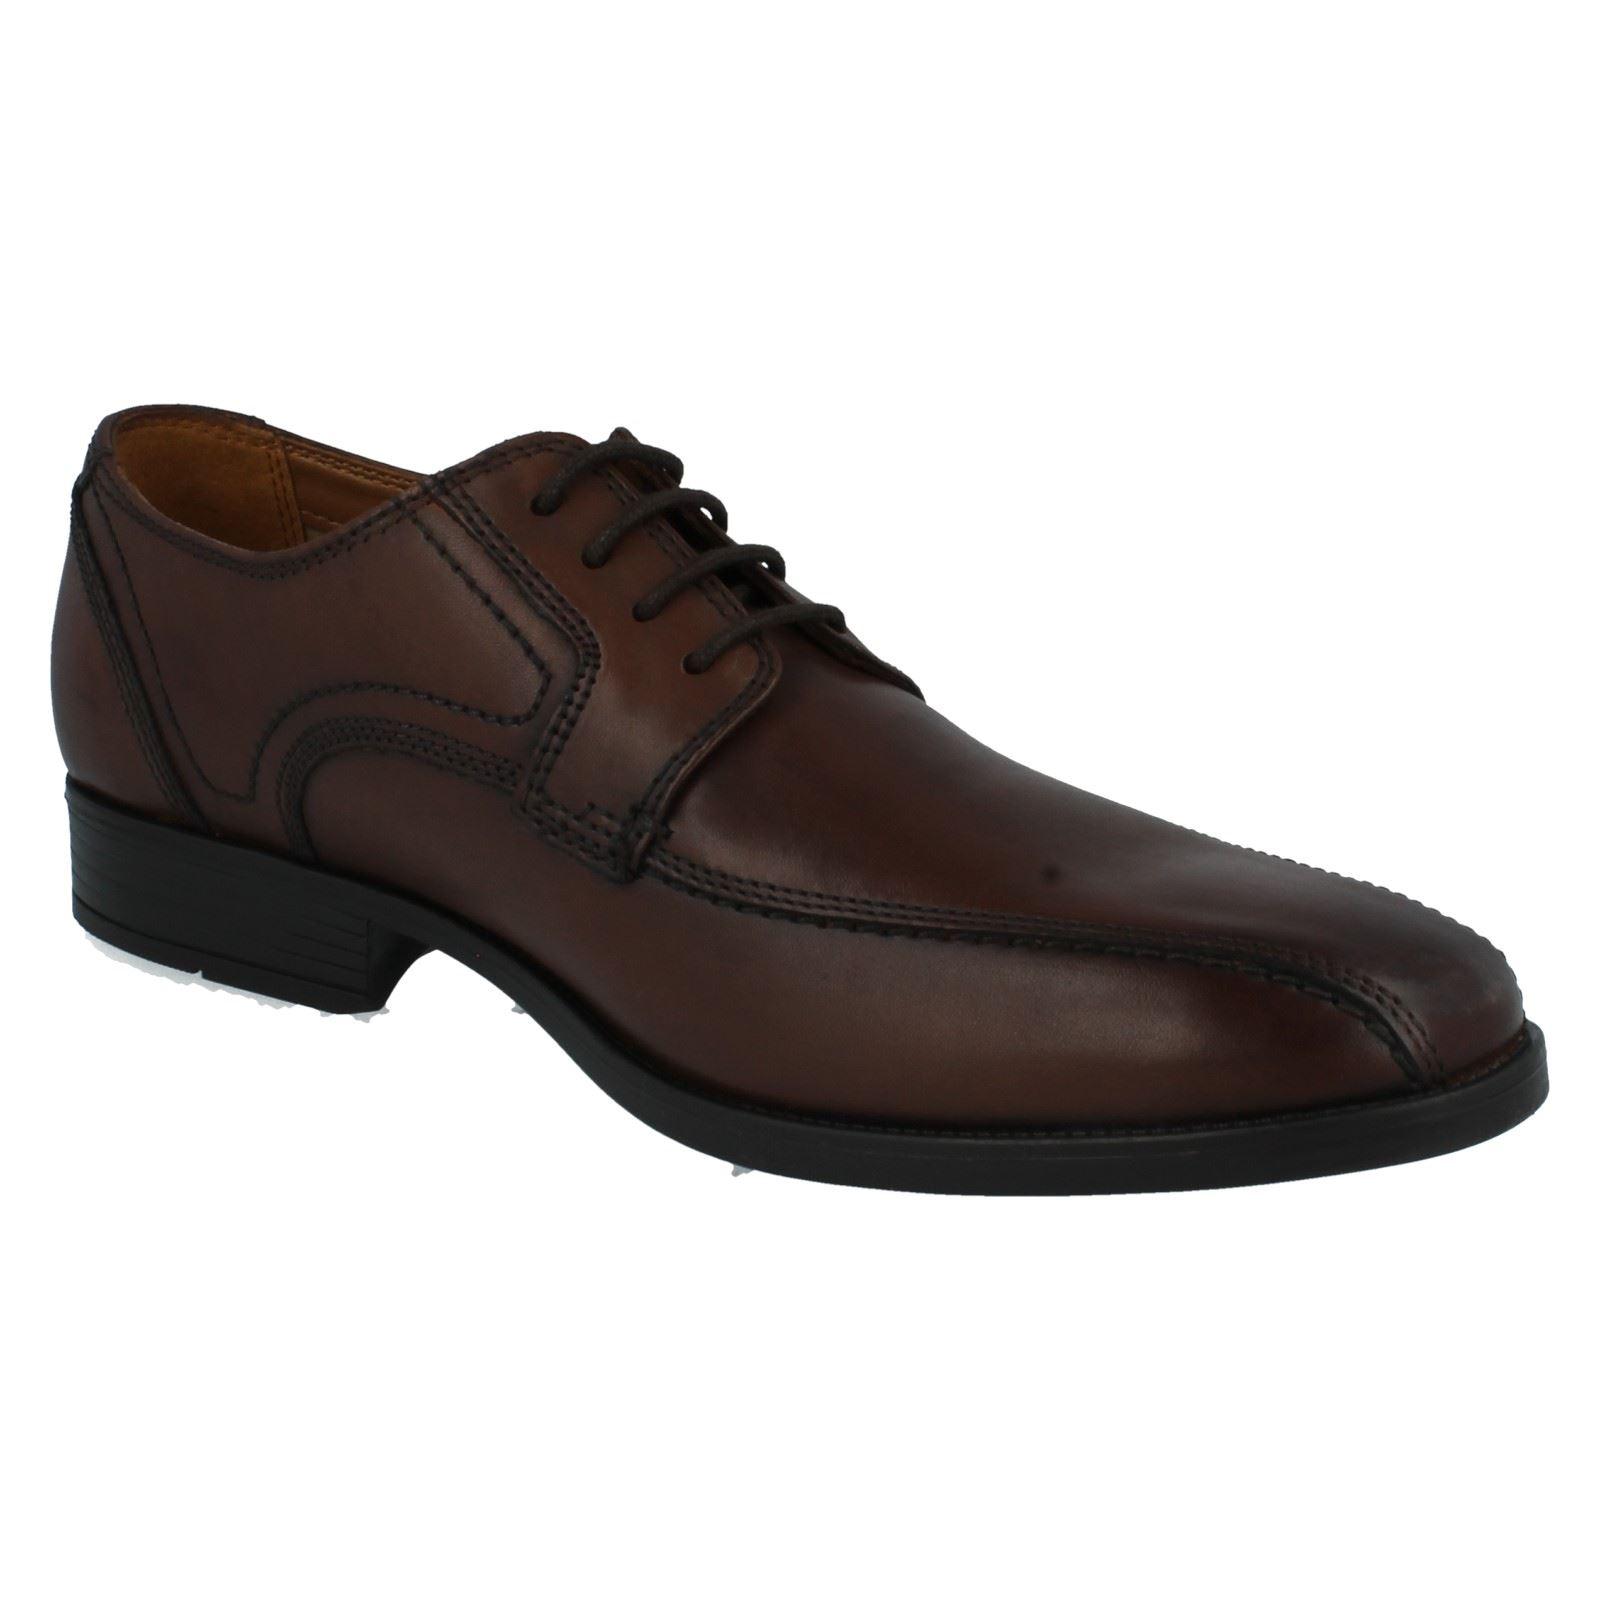 Men's Schuhes Clarks Lace Up Formal Schuhes Men's - Kalden Vibe 298bdd